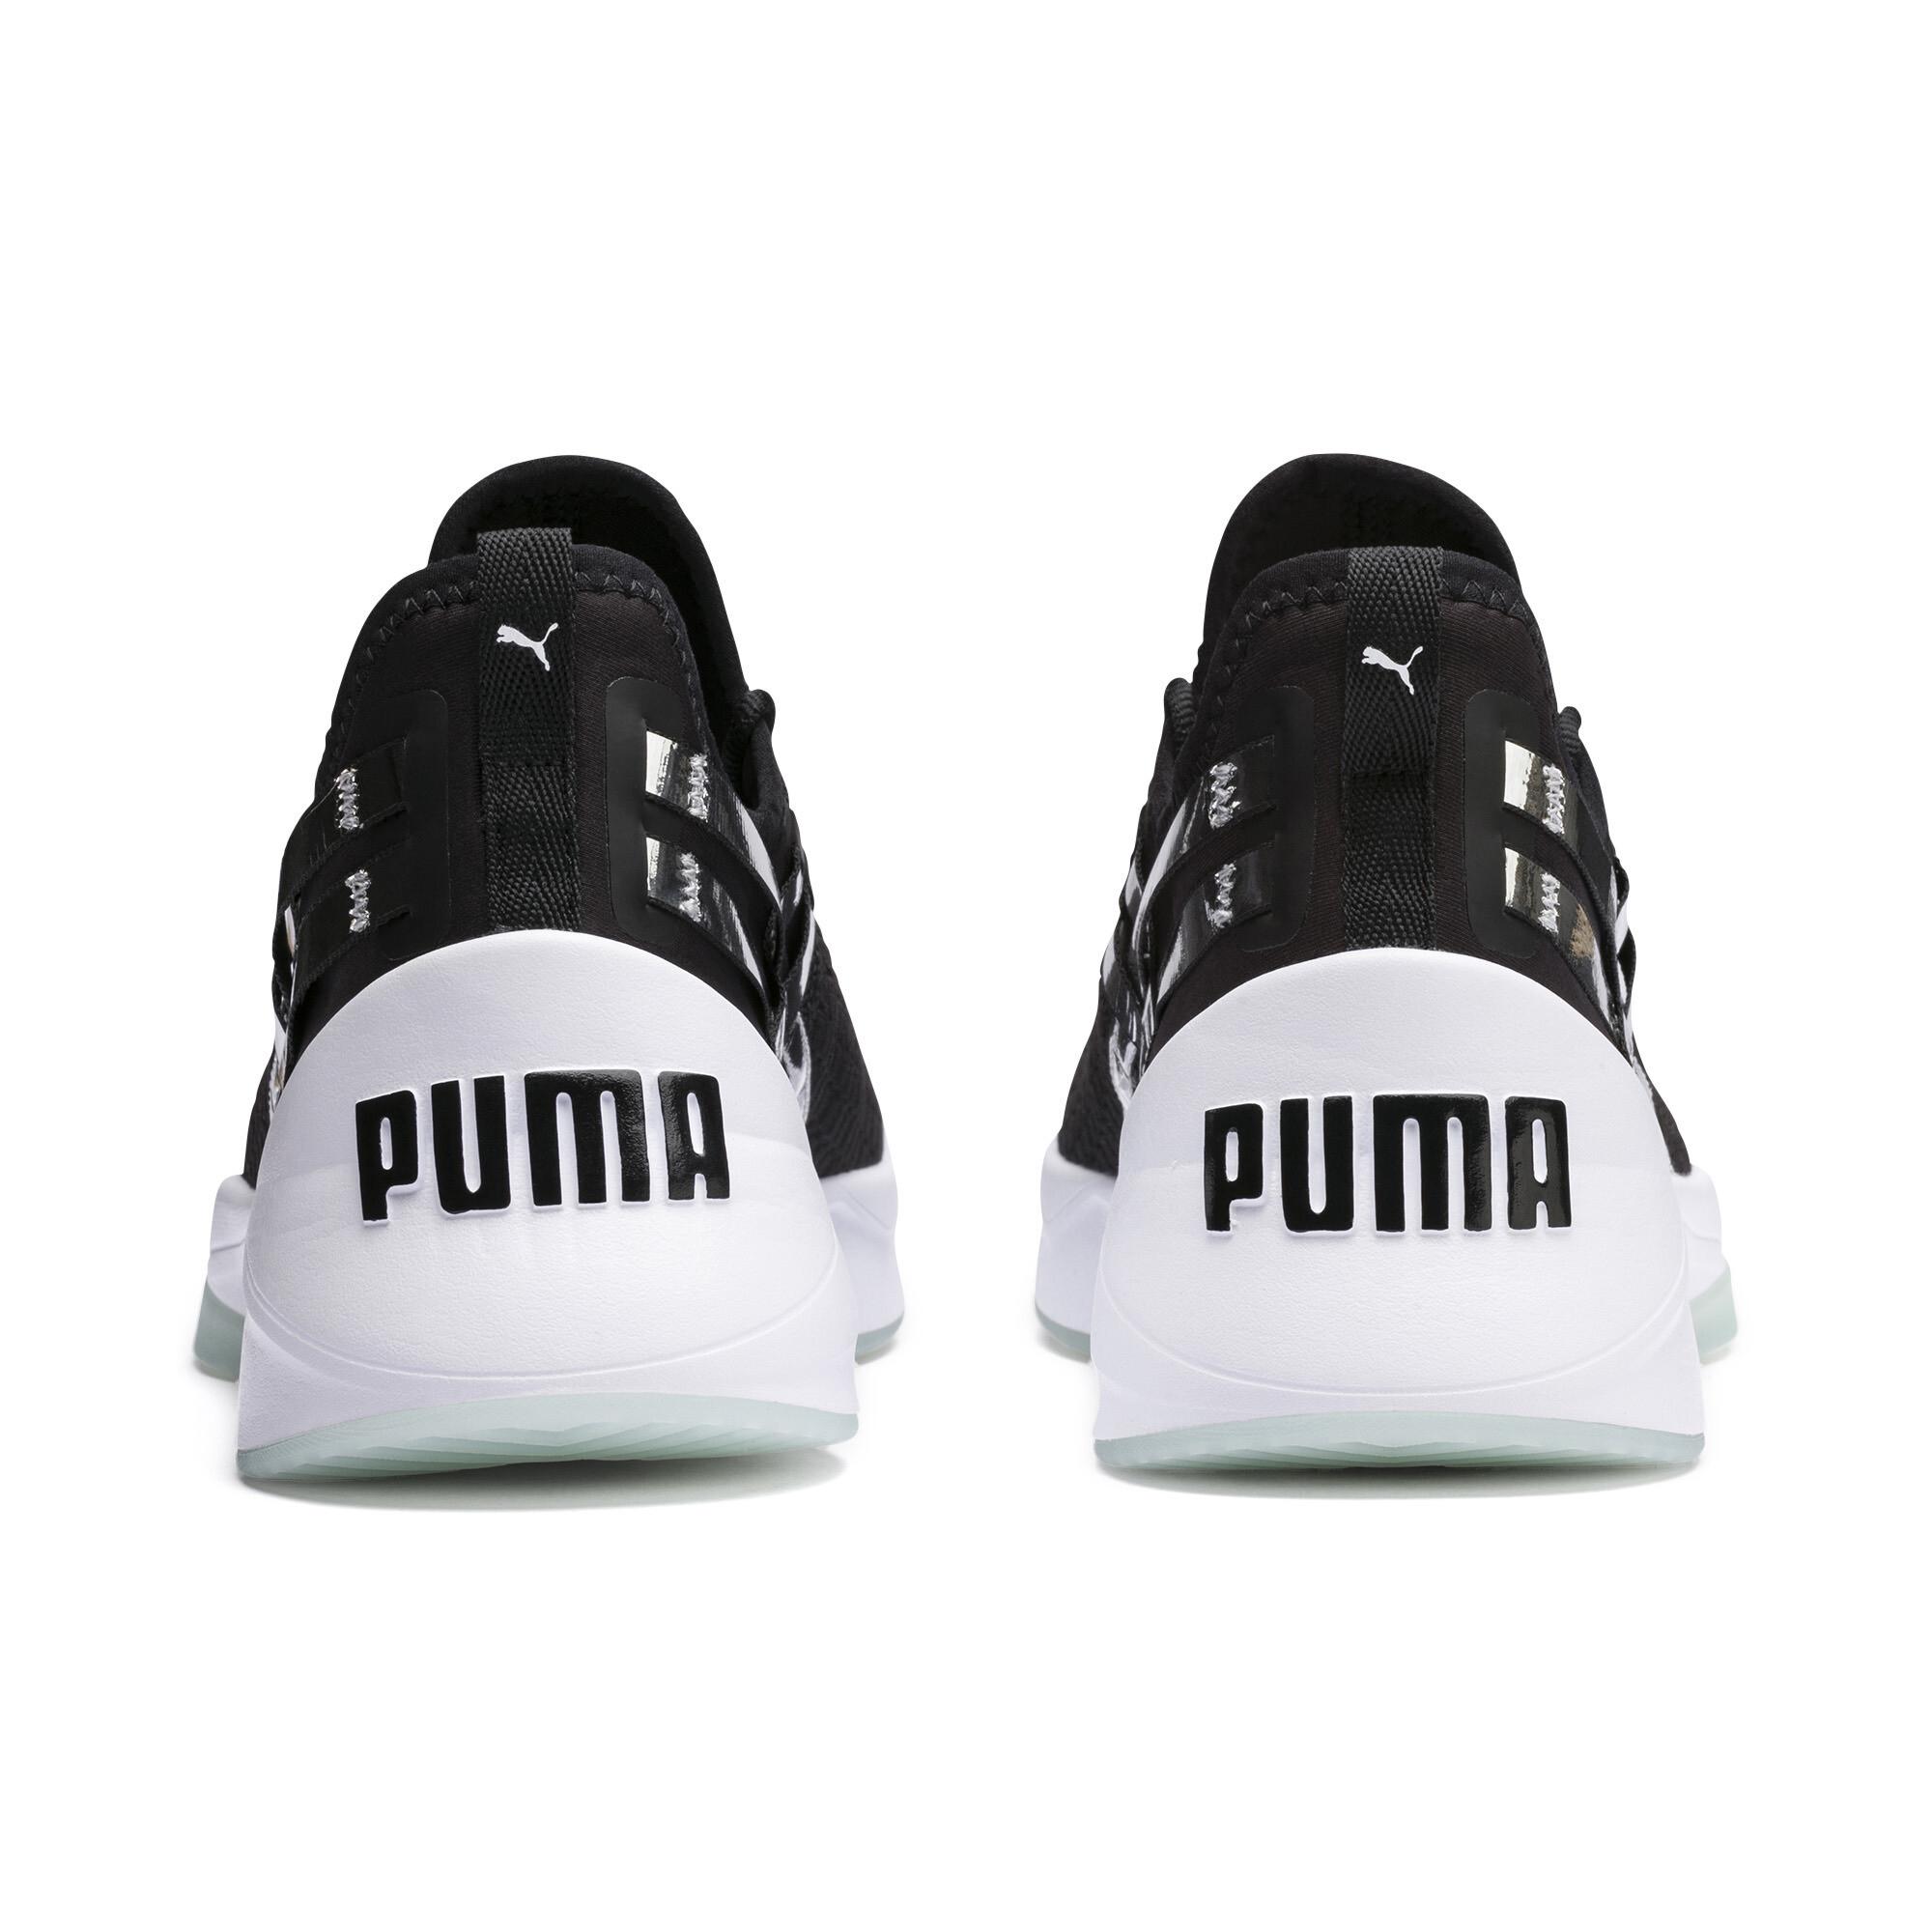 reputable site 616a9 ea27c Image Puma Jaab XT TZ Women s Training Shoes  3